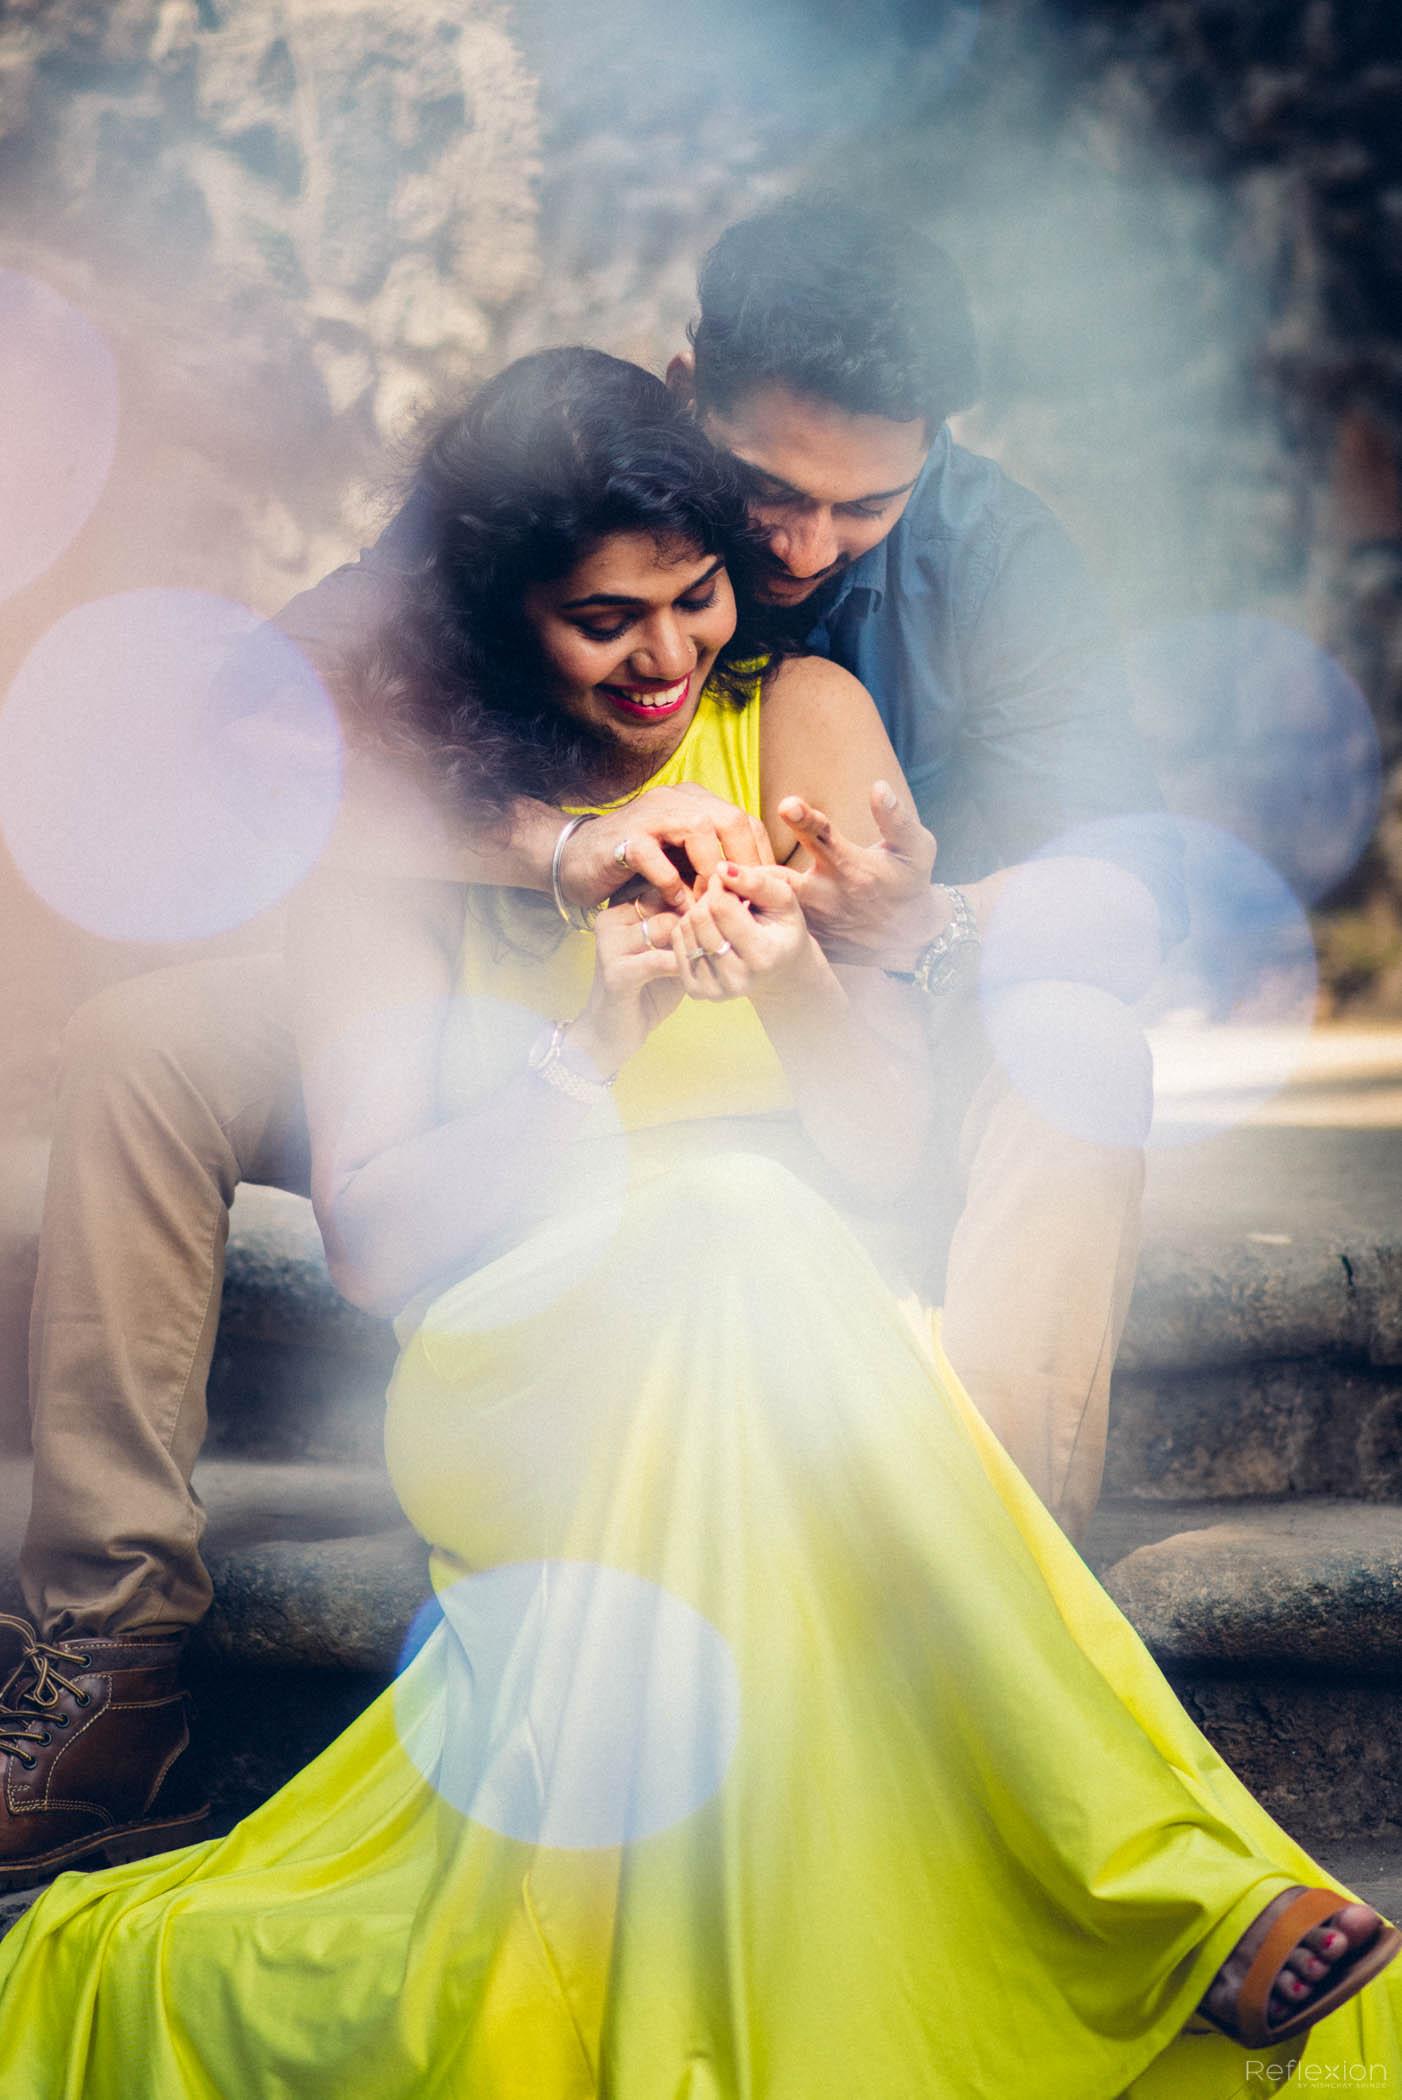 prewedding-shoot-vasai-9.jpg